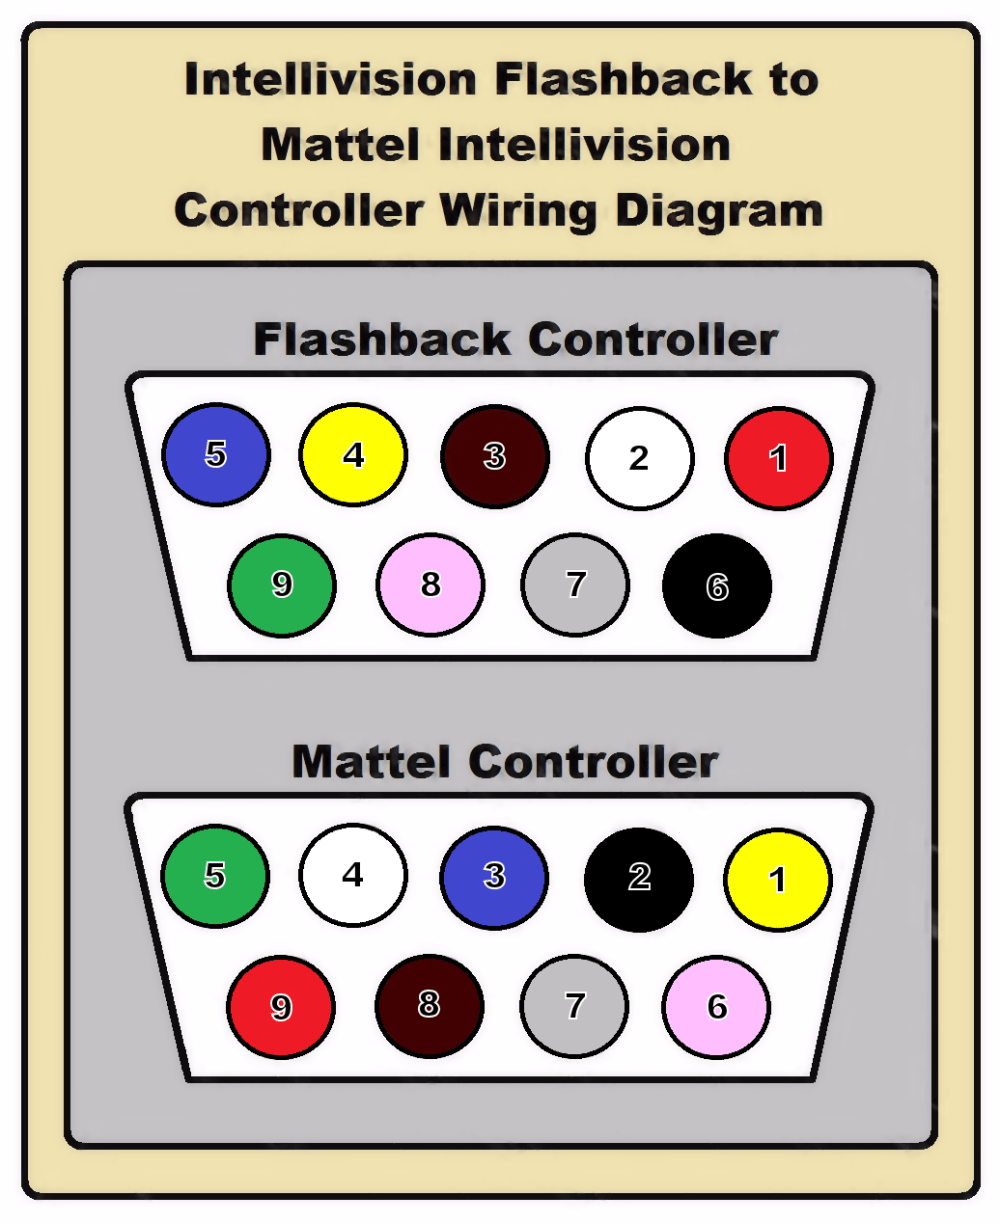 medium resolution of fb to original controller pinouts png